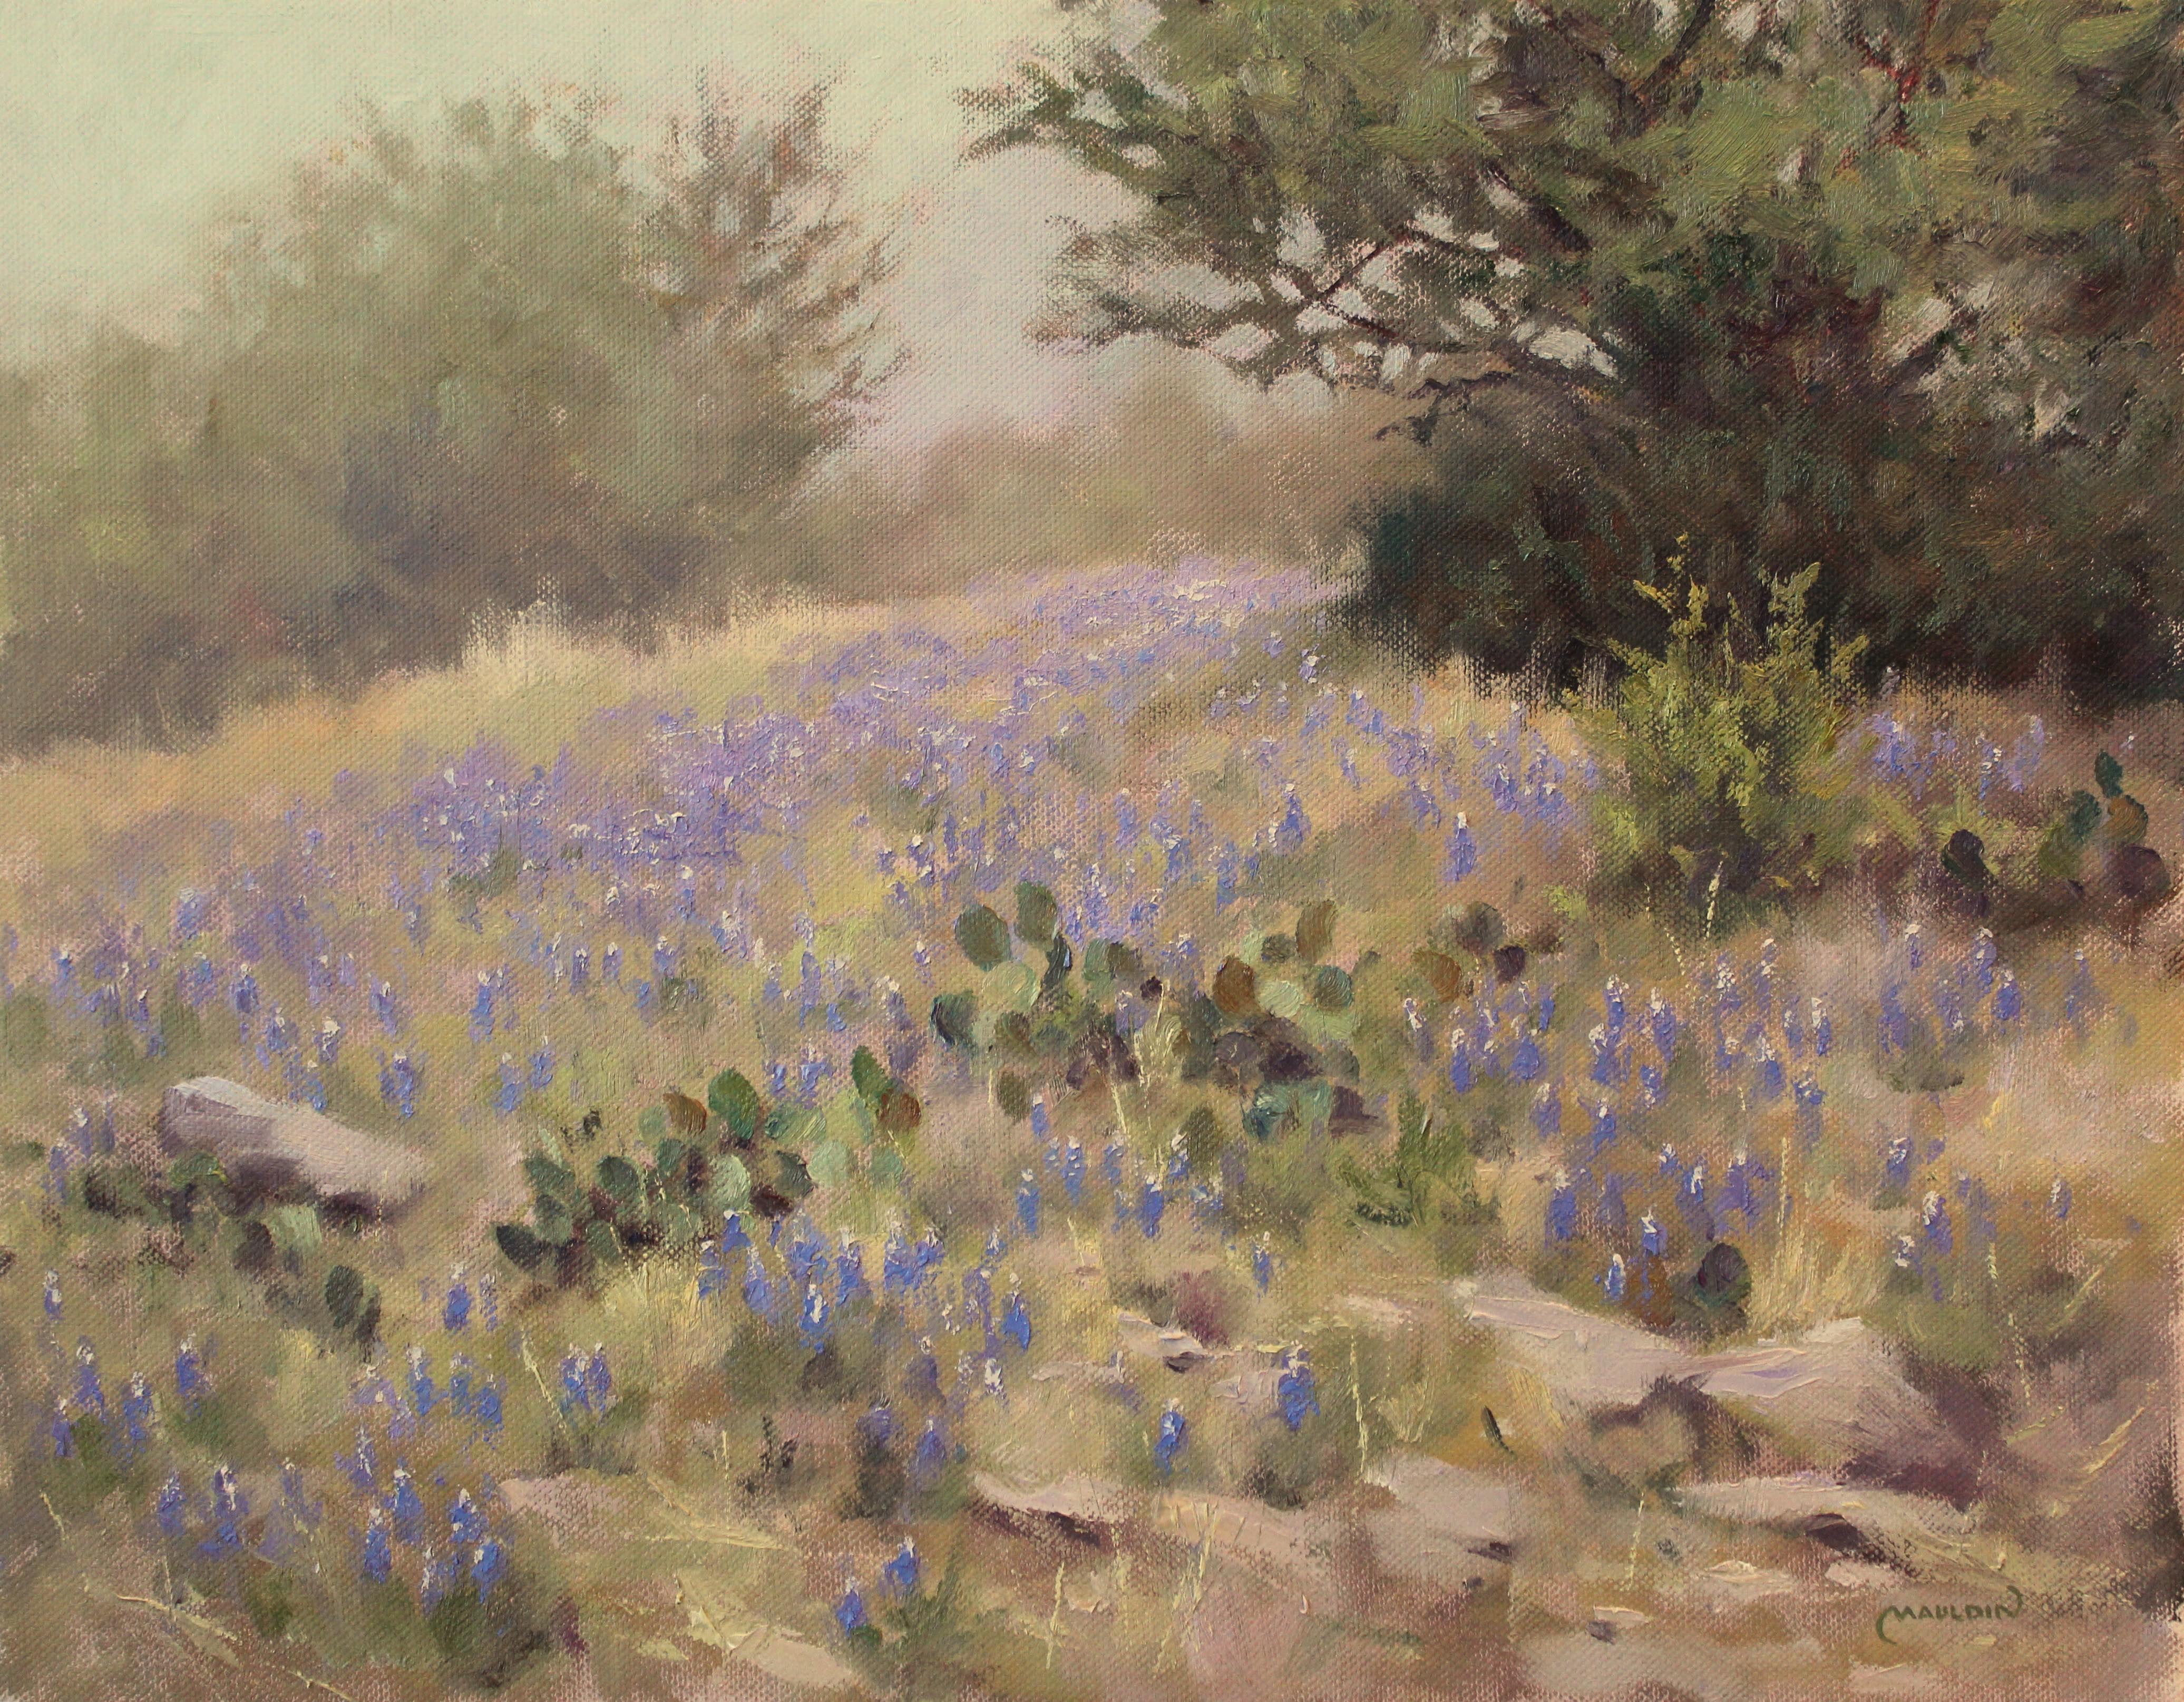 Marching In by  Chuck Mauldin - Masterpiece Online